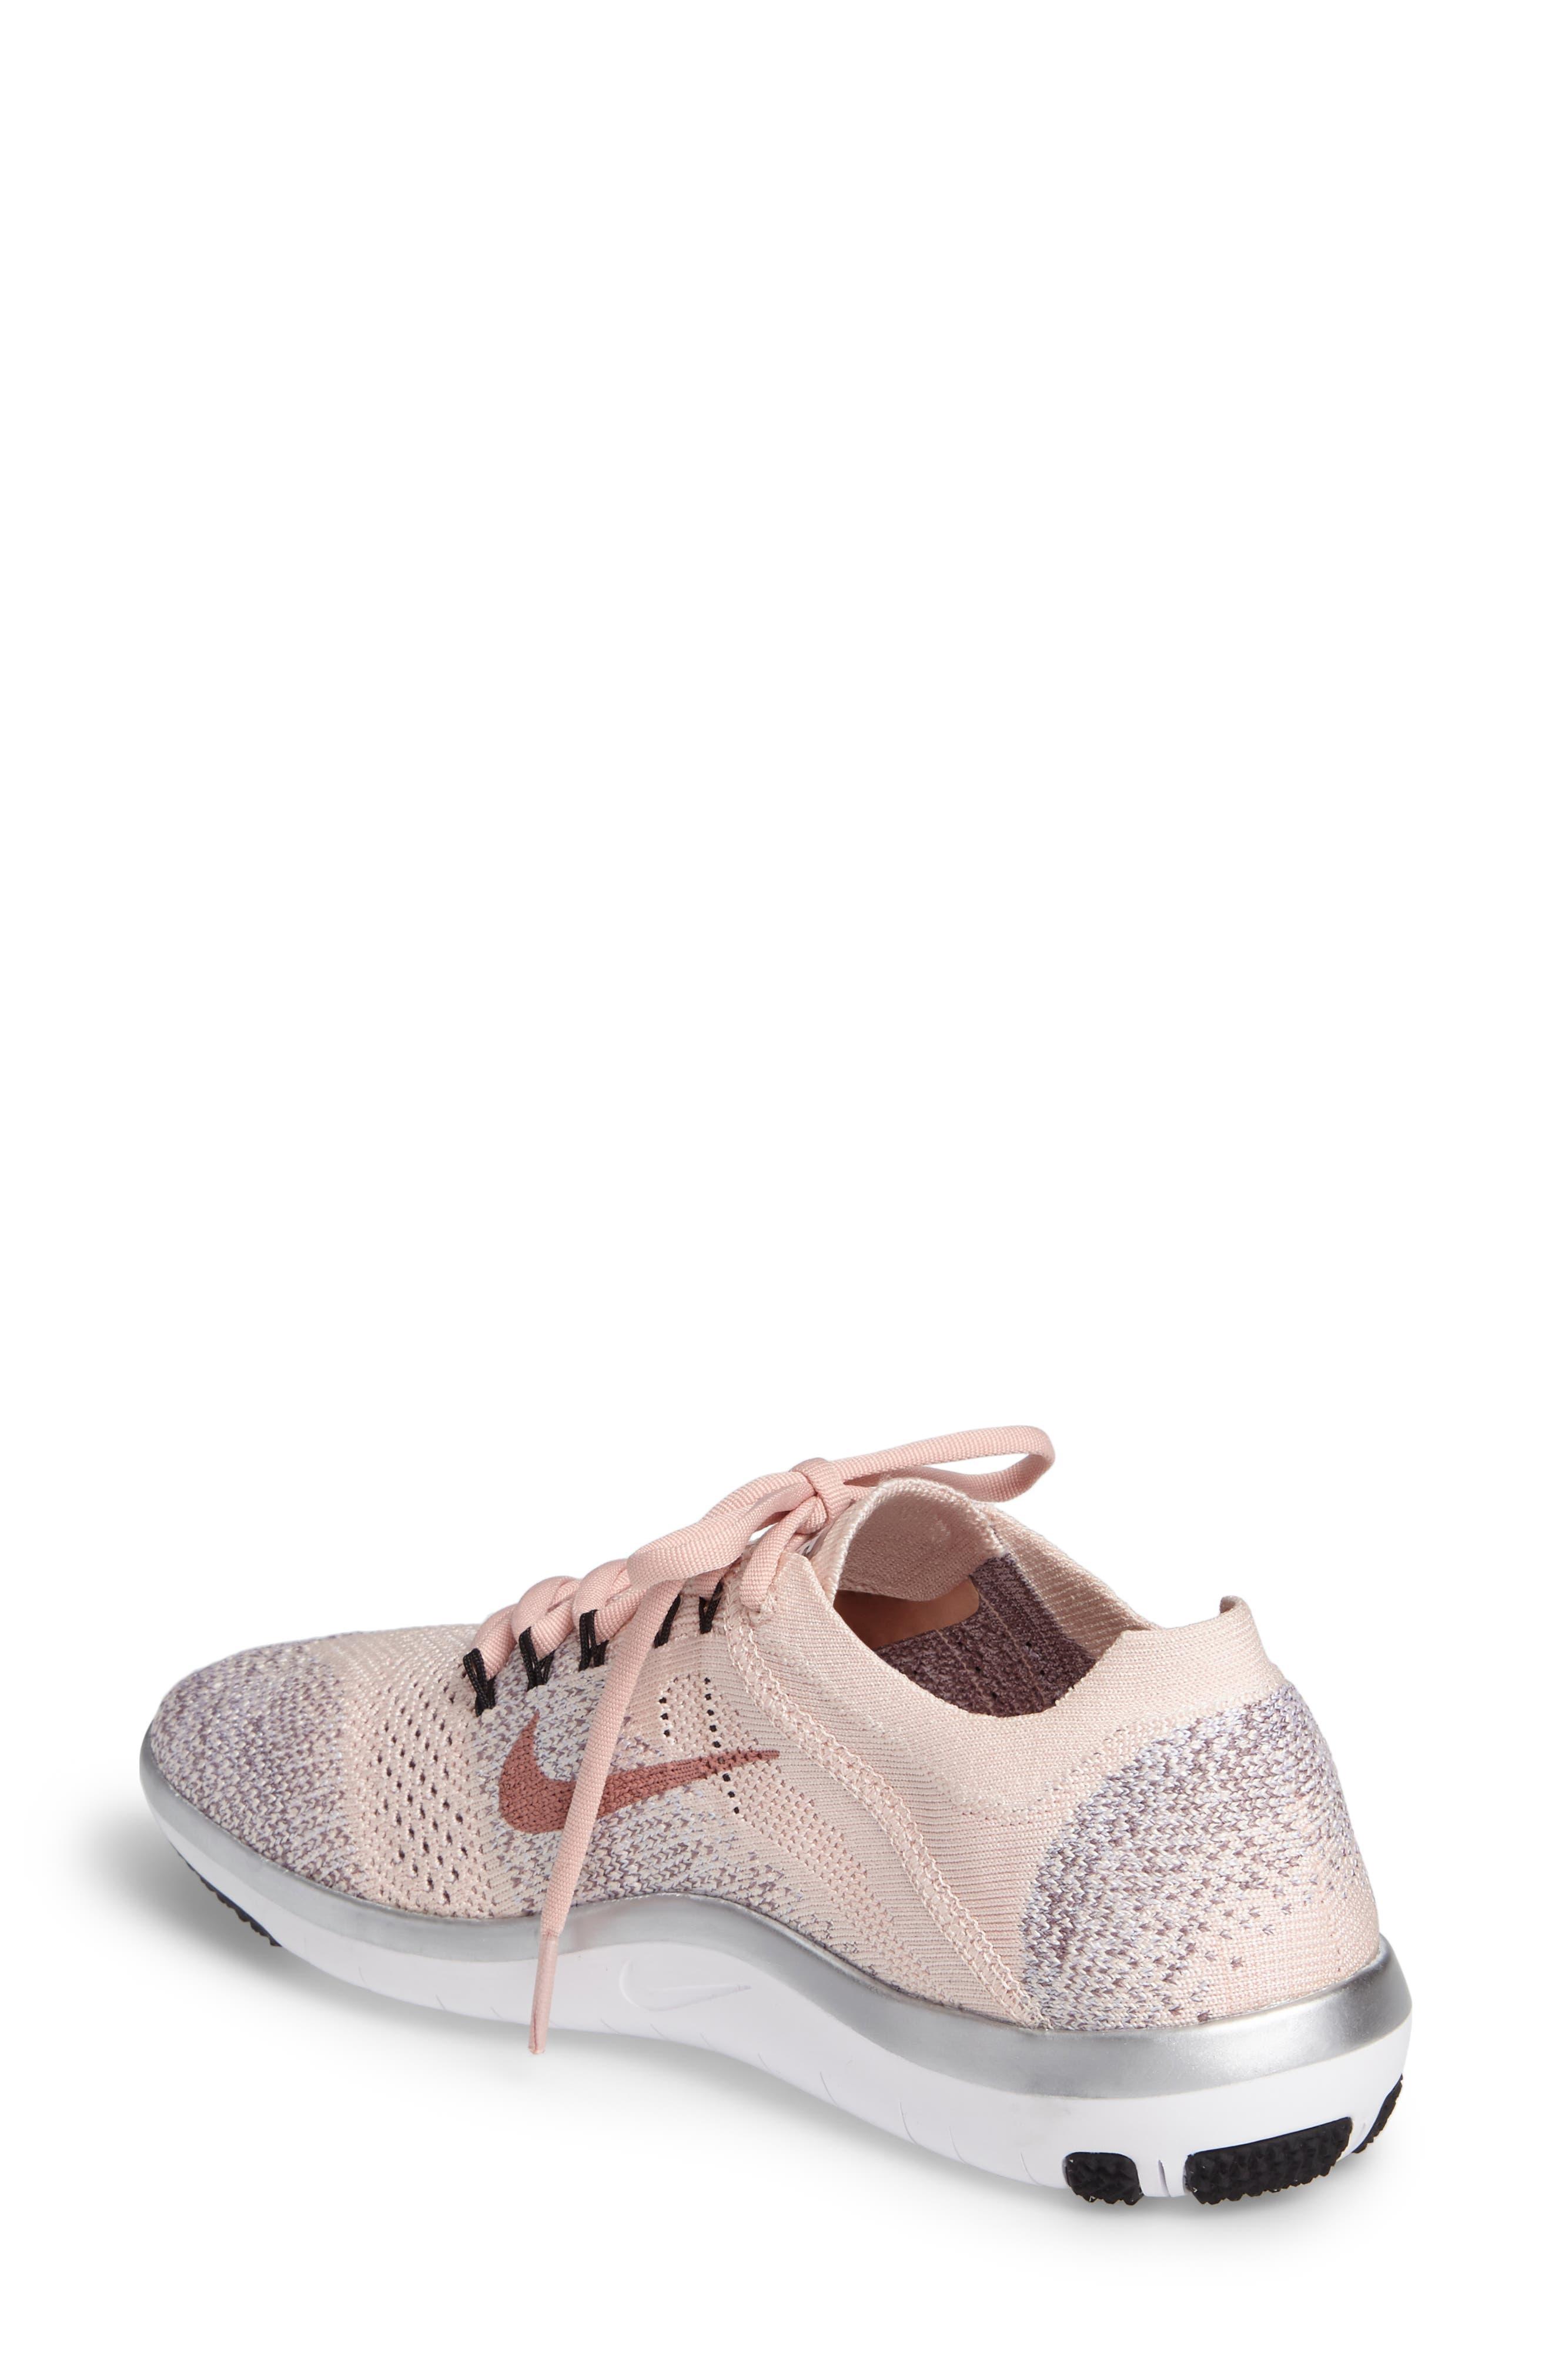 Alternate Image 2  - Nike Free Focus Flyknit 2 Bionic Training Shoe (Women)